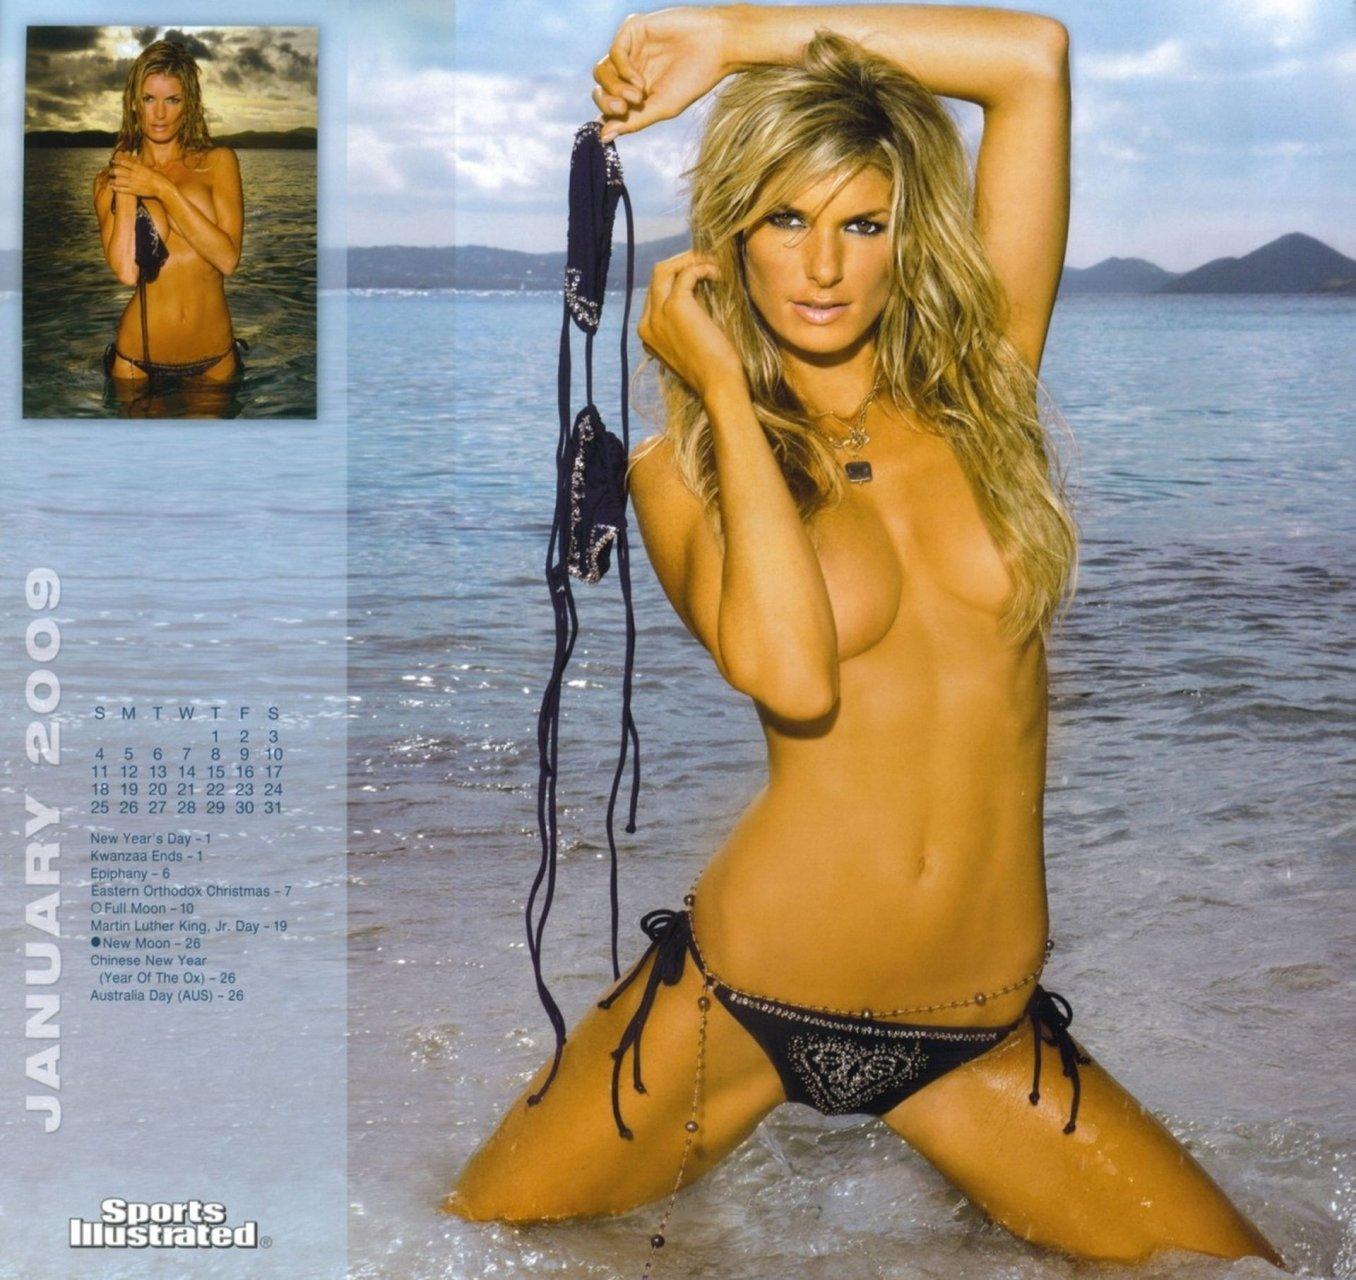 Marisa-Miller-Nude-TheFappeningBlog.com-13.jpg